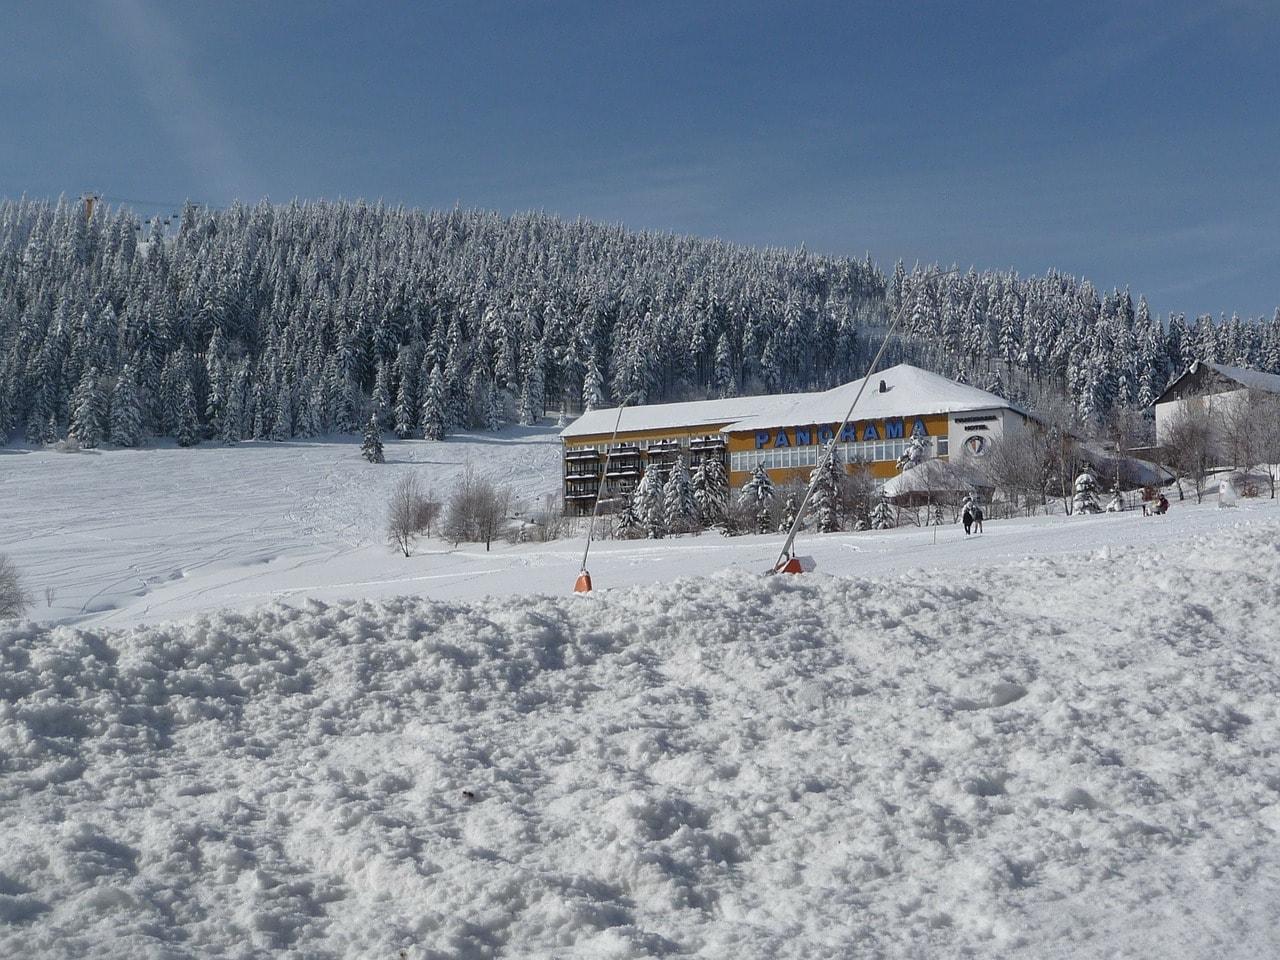 oberwiesenthal-246565_1280